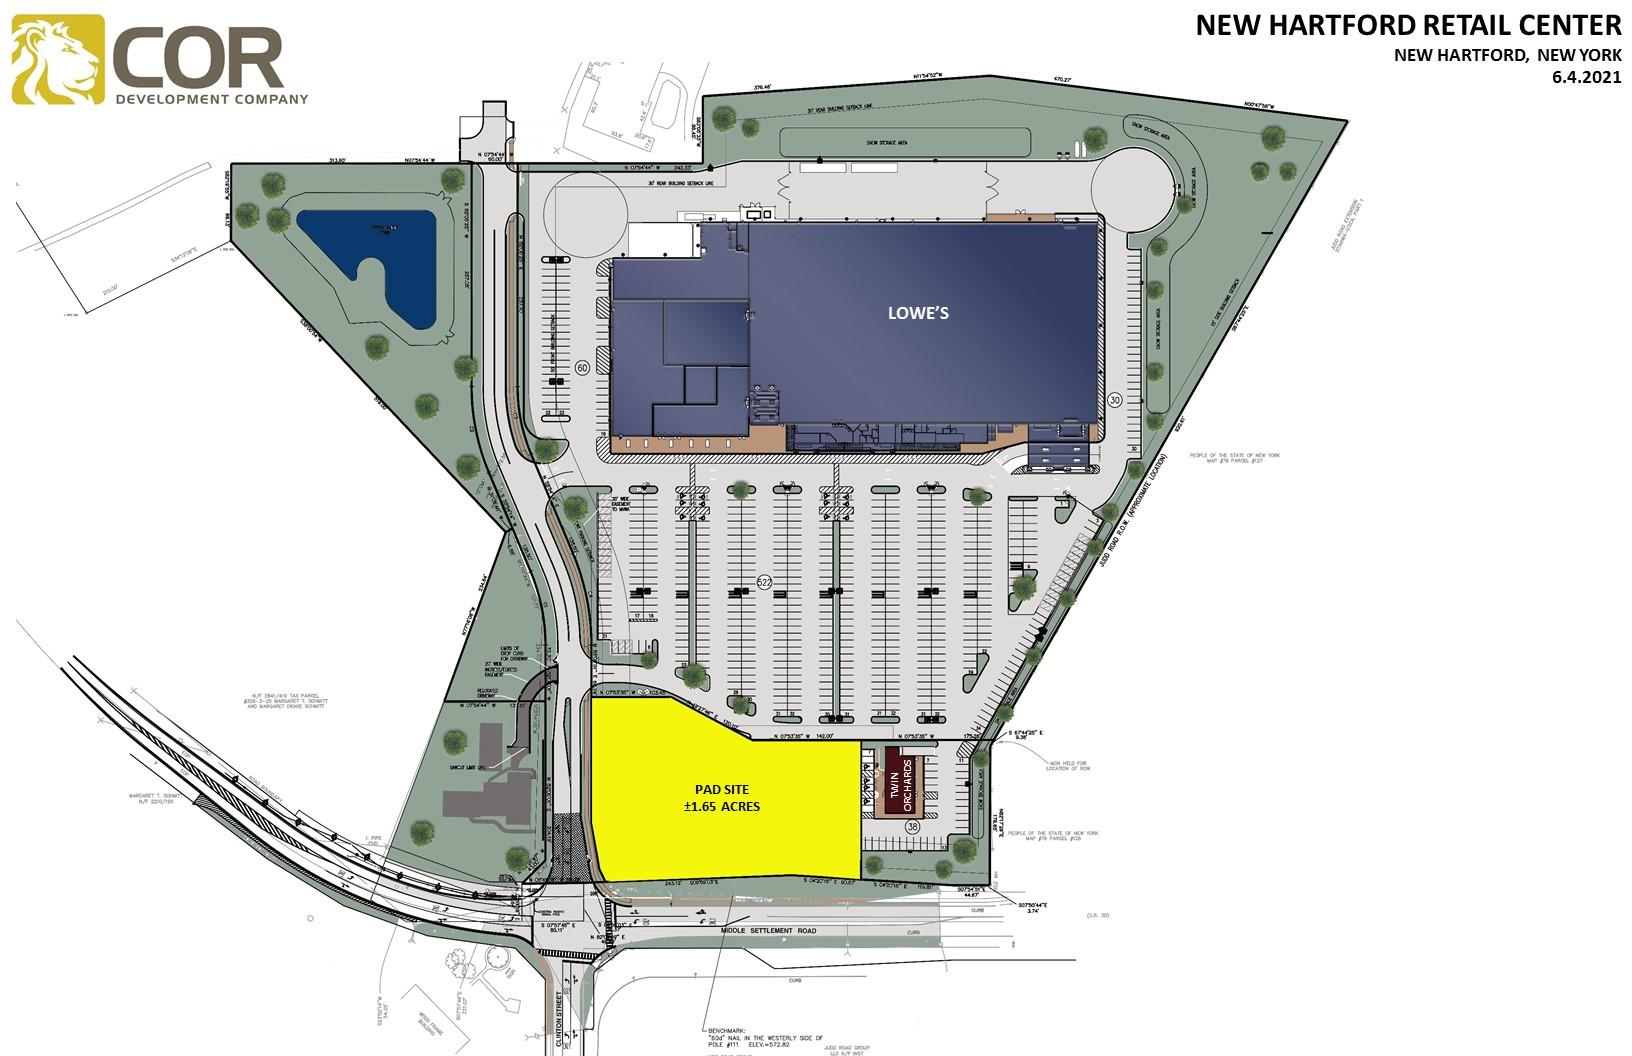 NEW HARTFORD RETAIL CENTER MASTER SITE PLAN - New Hartford Retail Center – New Hartford, NY